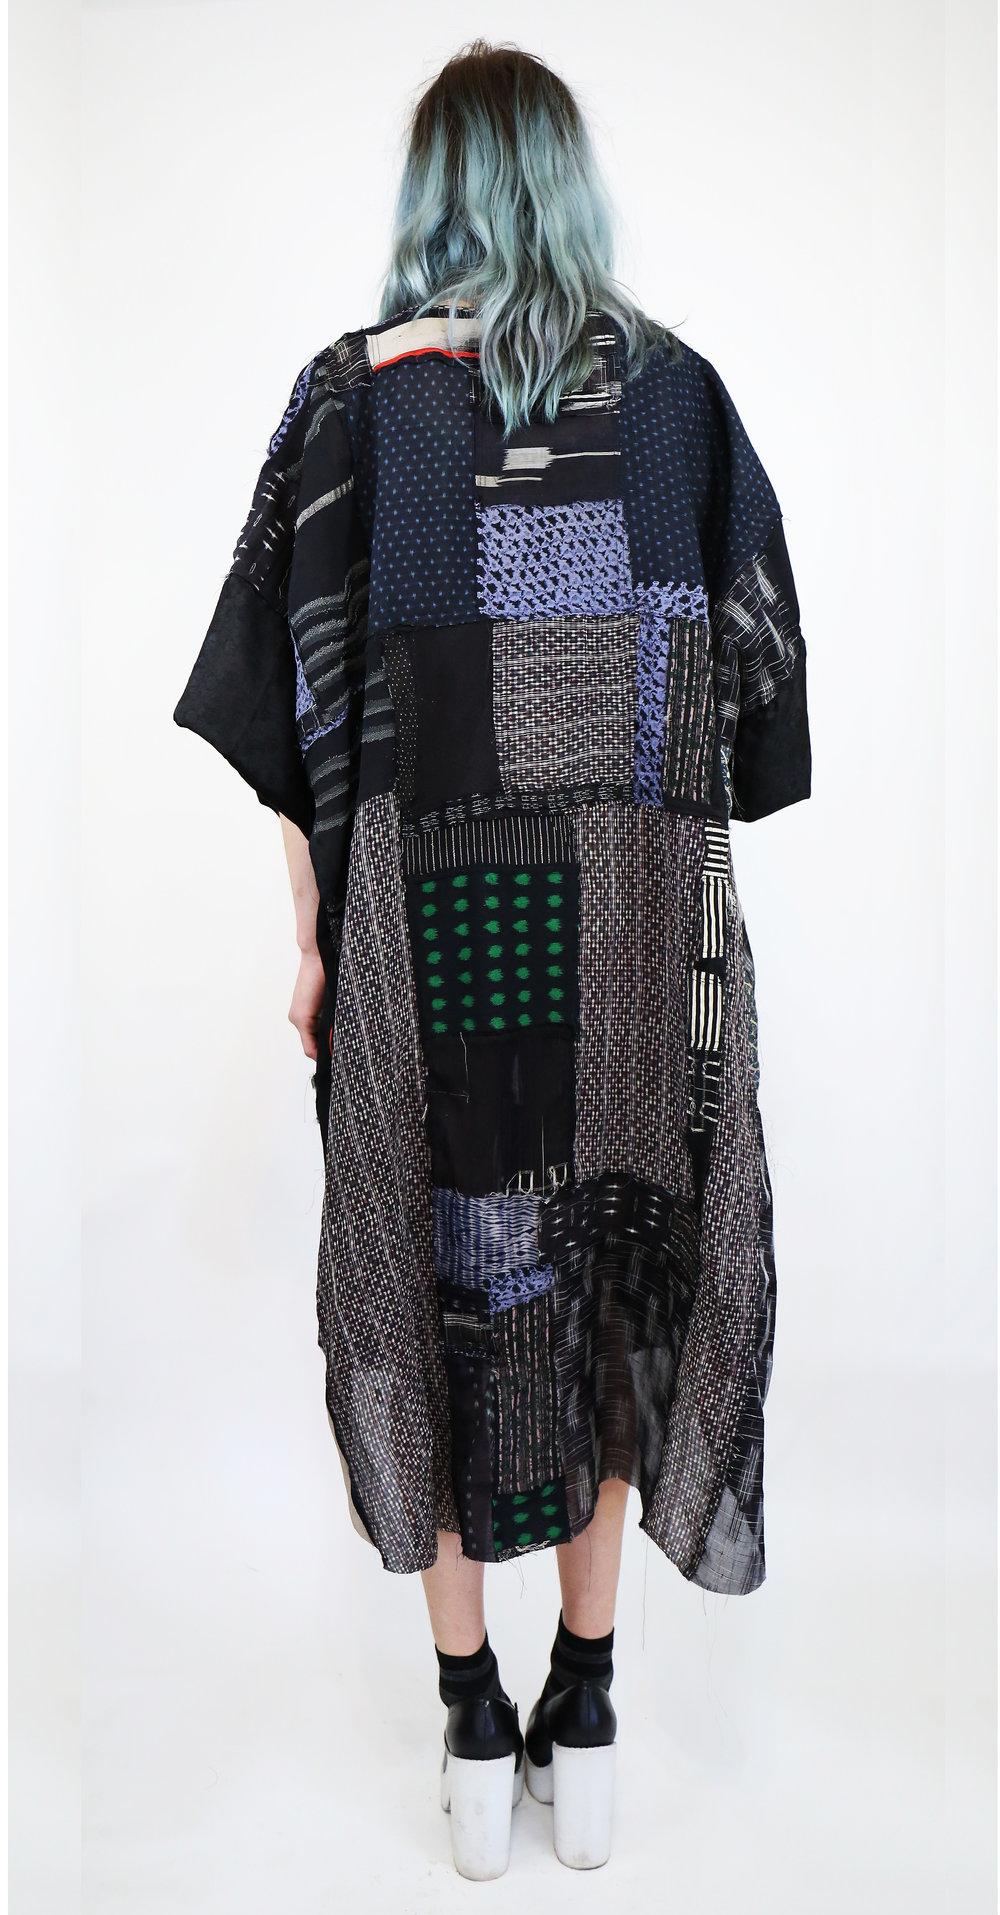 hadley_dress#3_11.jpg